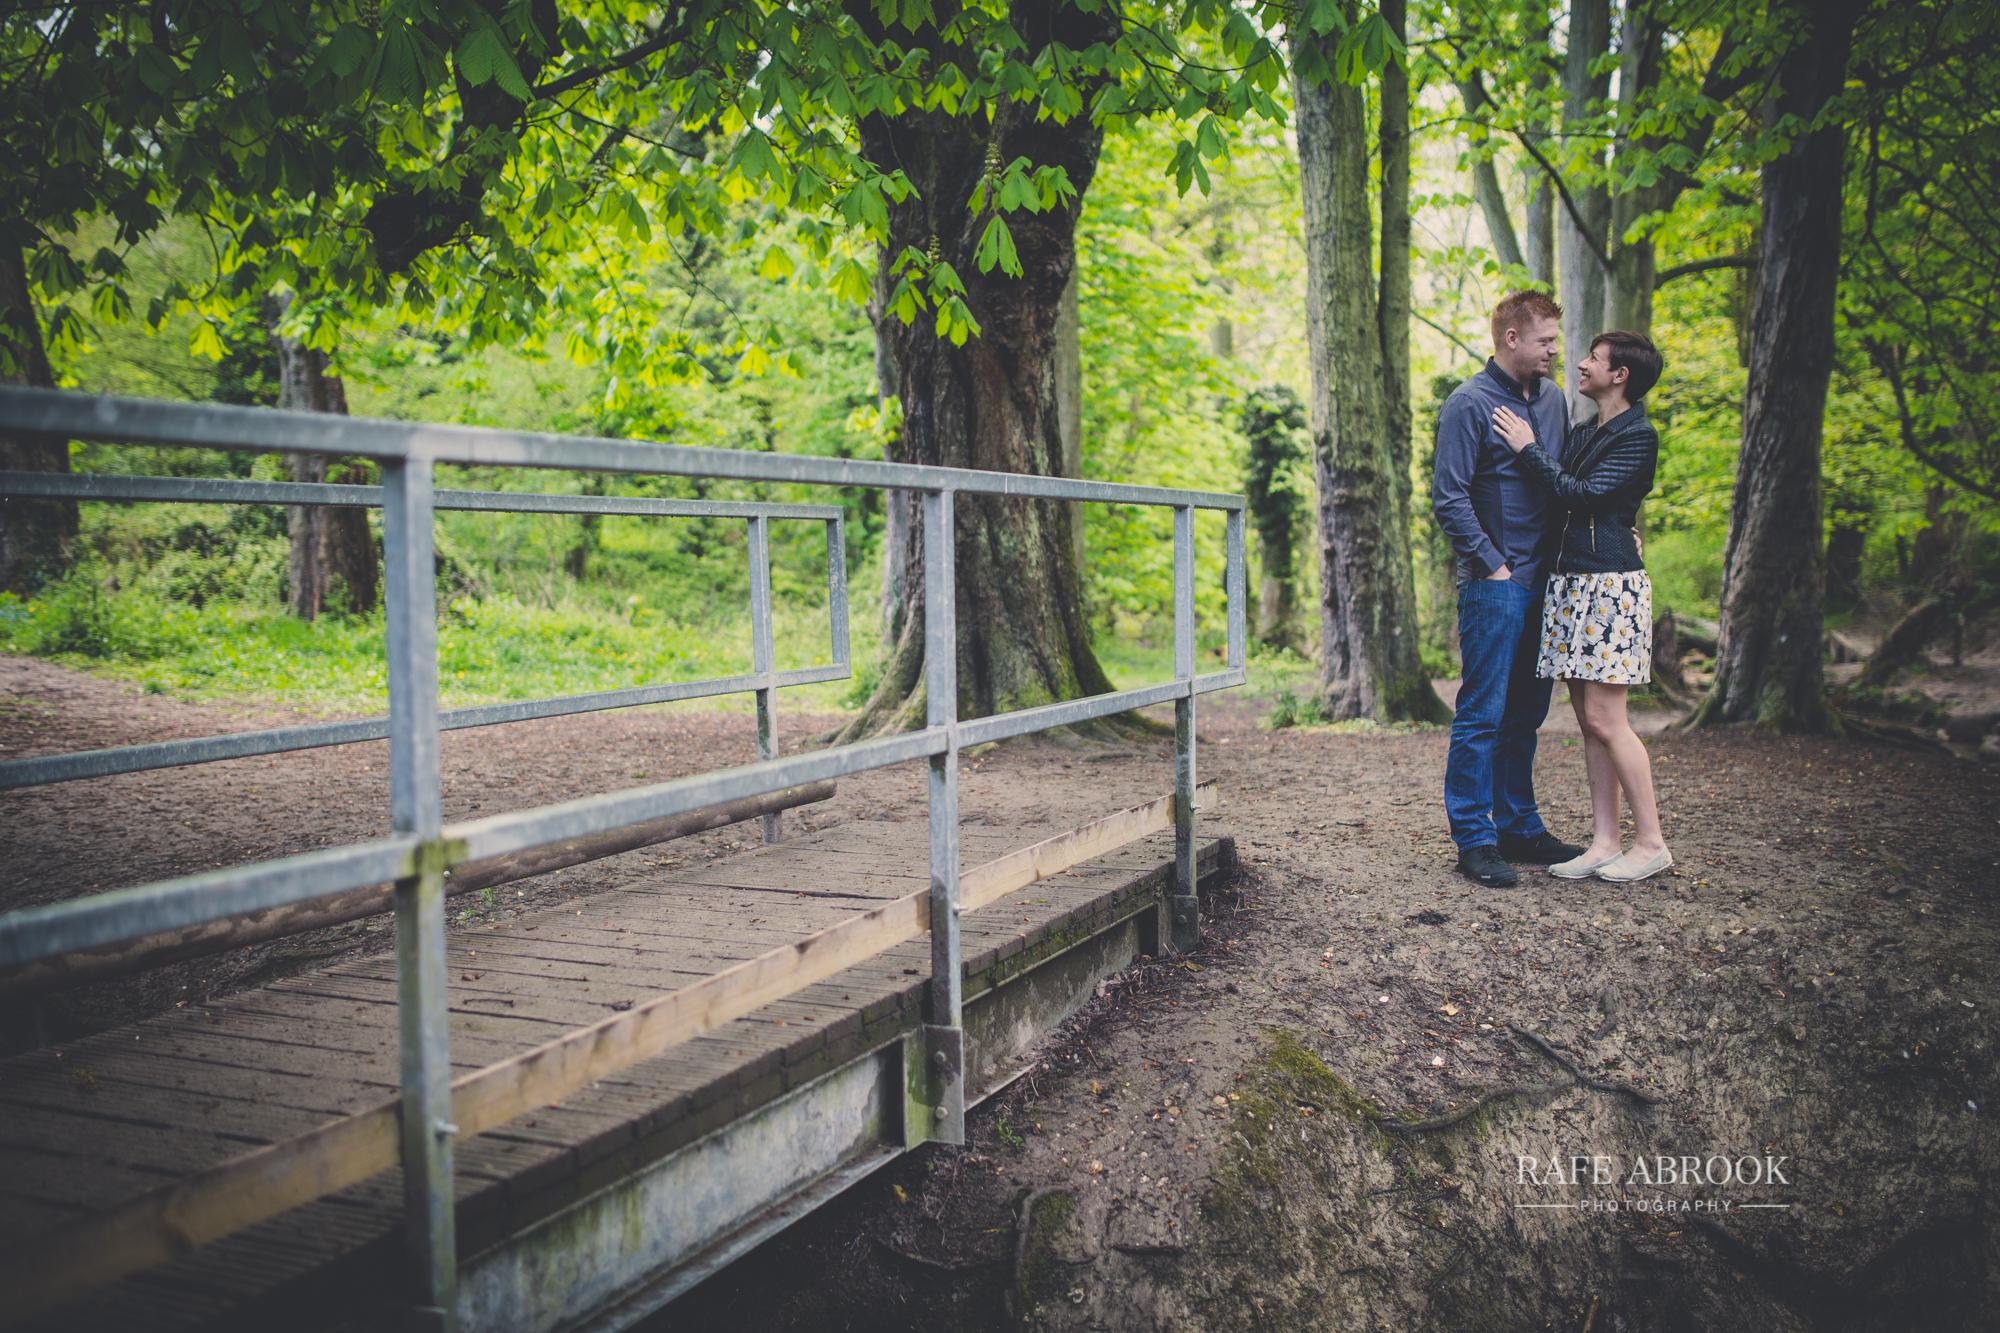 miriam & craig engagement shoot barton hills springs bedfordshire-1001.jpg